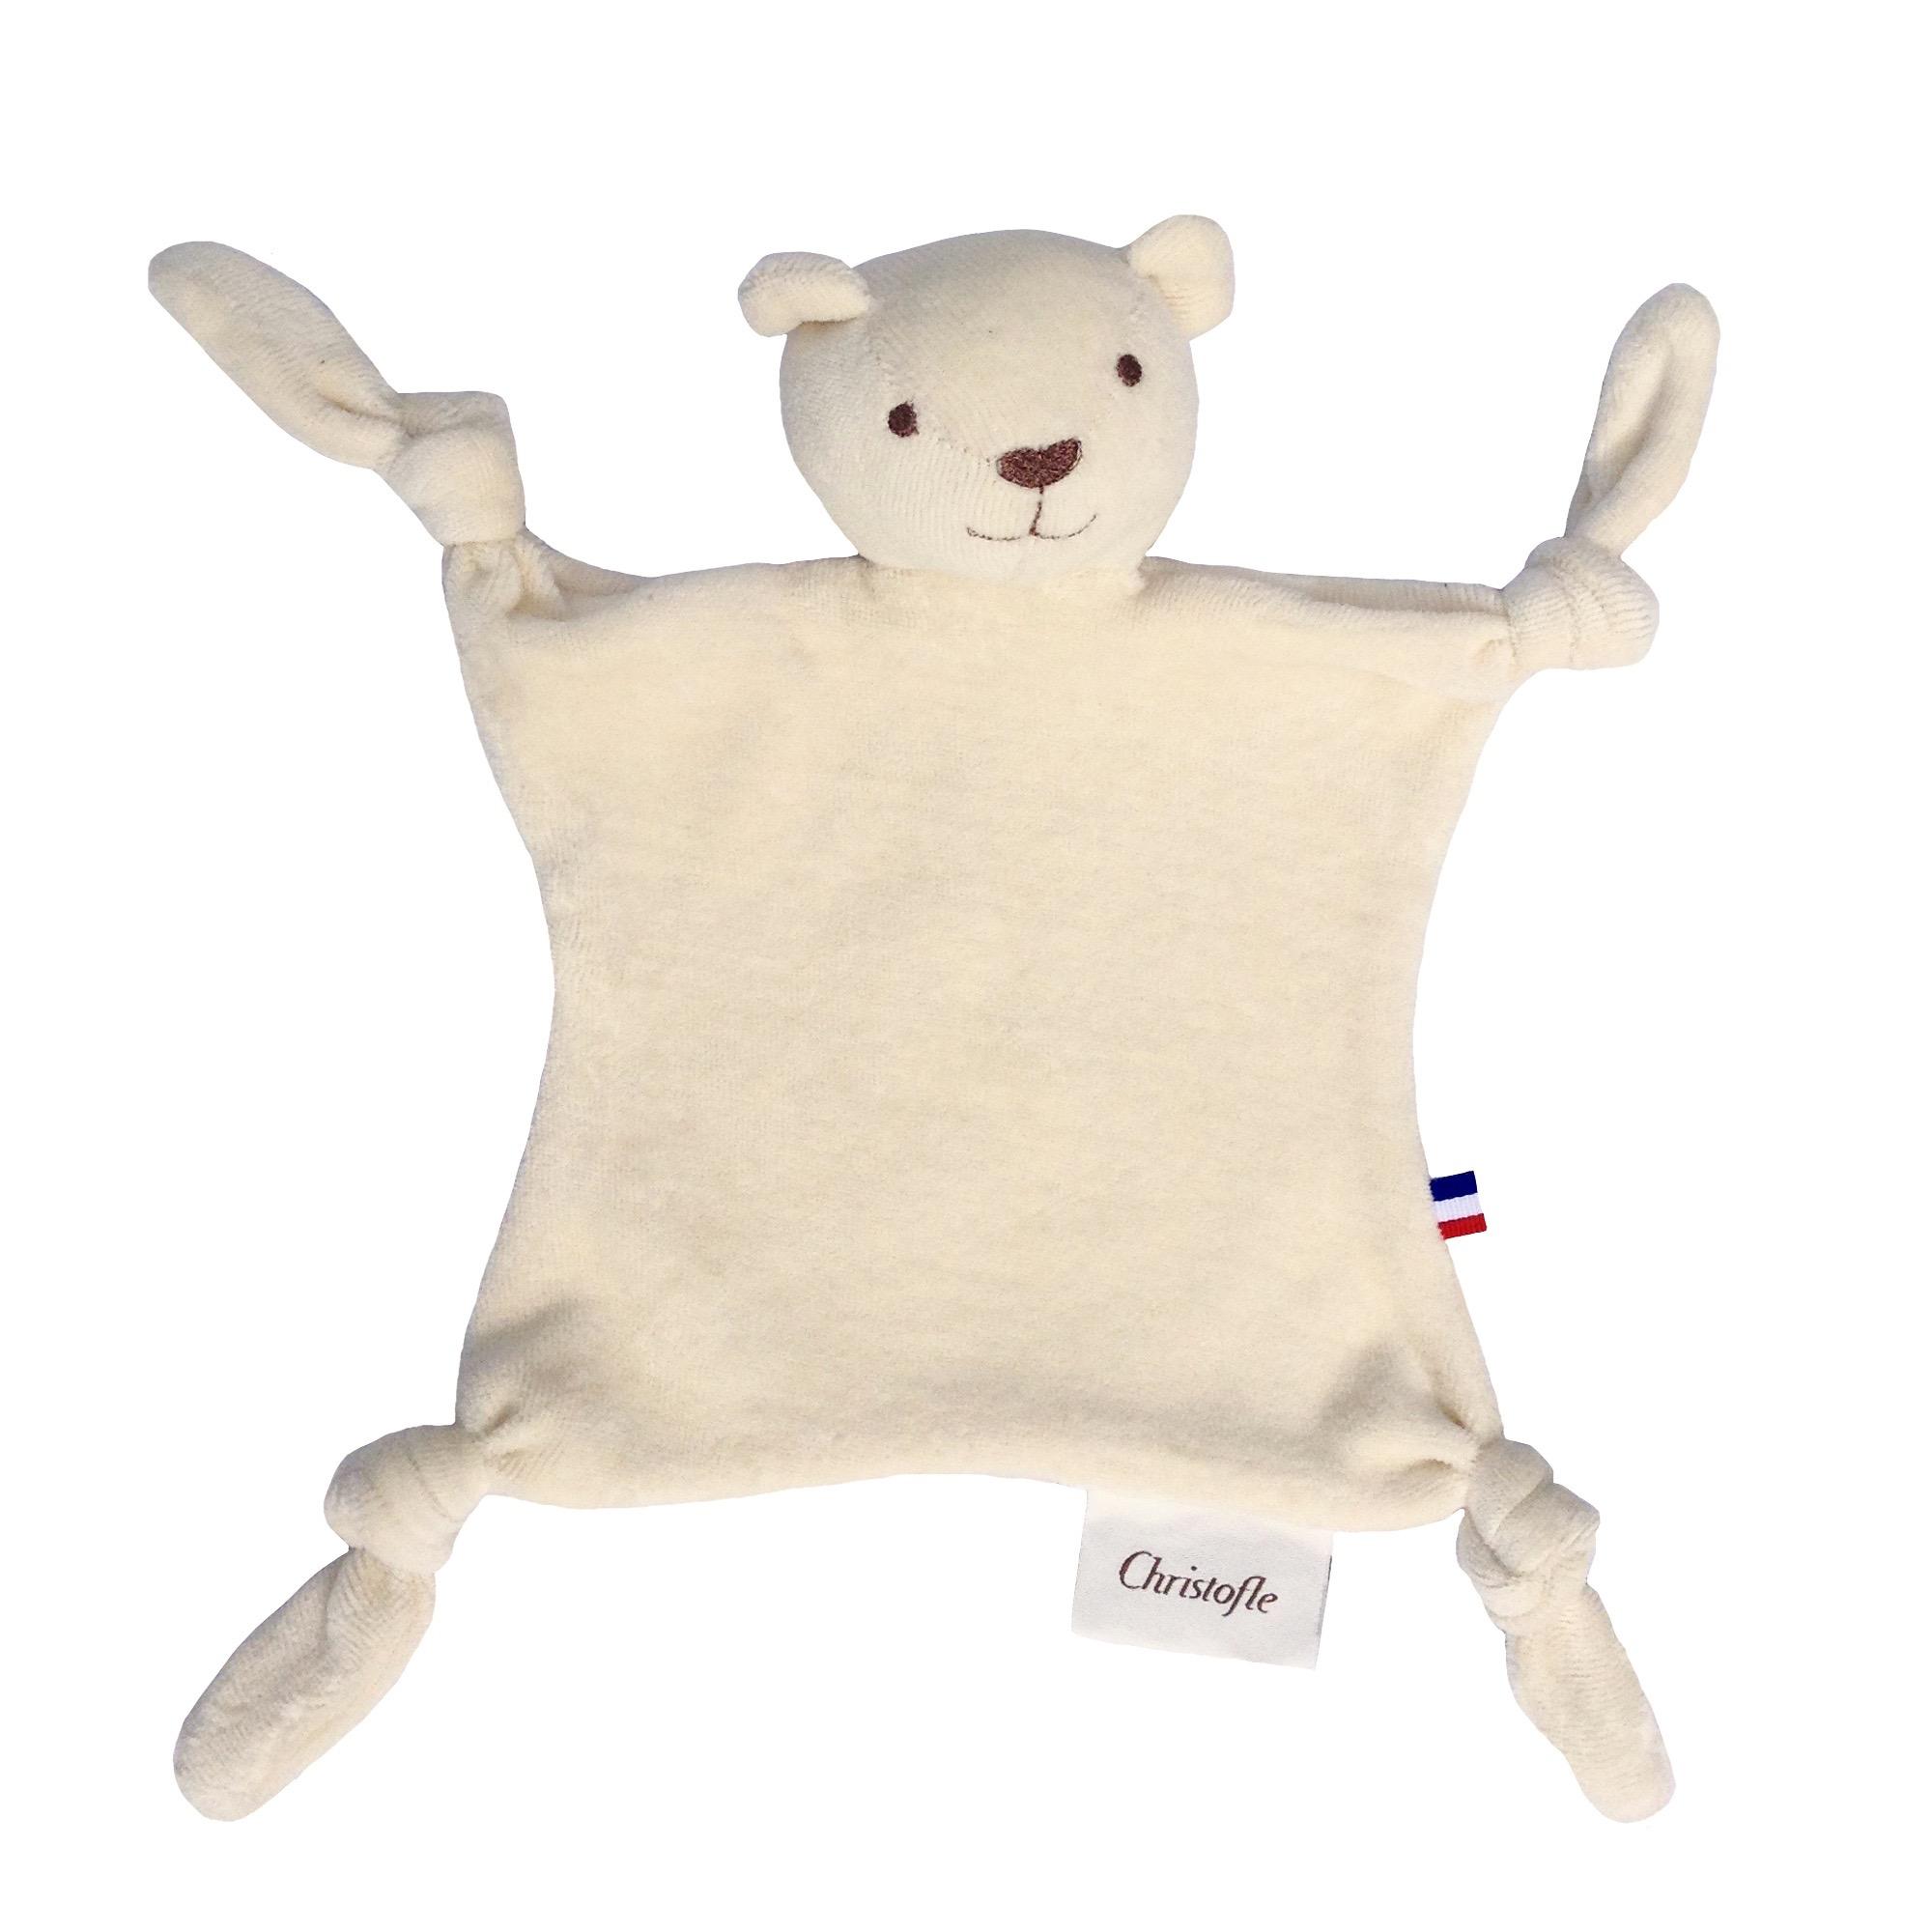 doudou-ours-charlie-bear-christofle-alexia-naumovic-bio